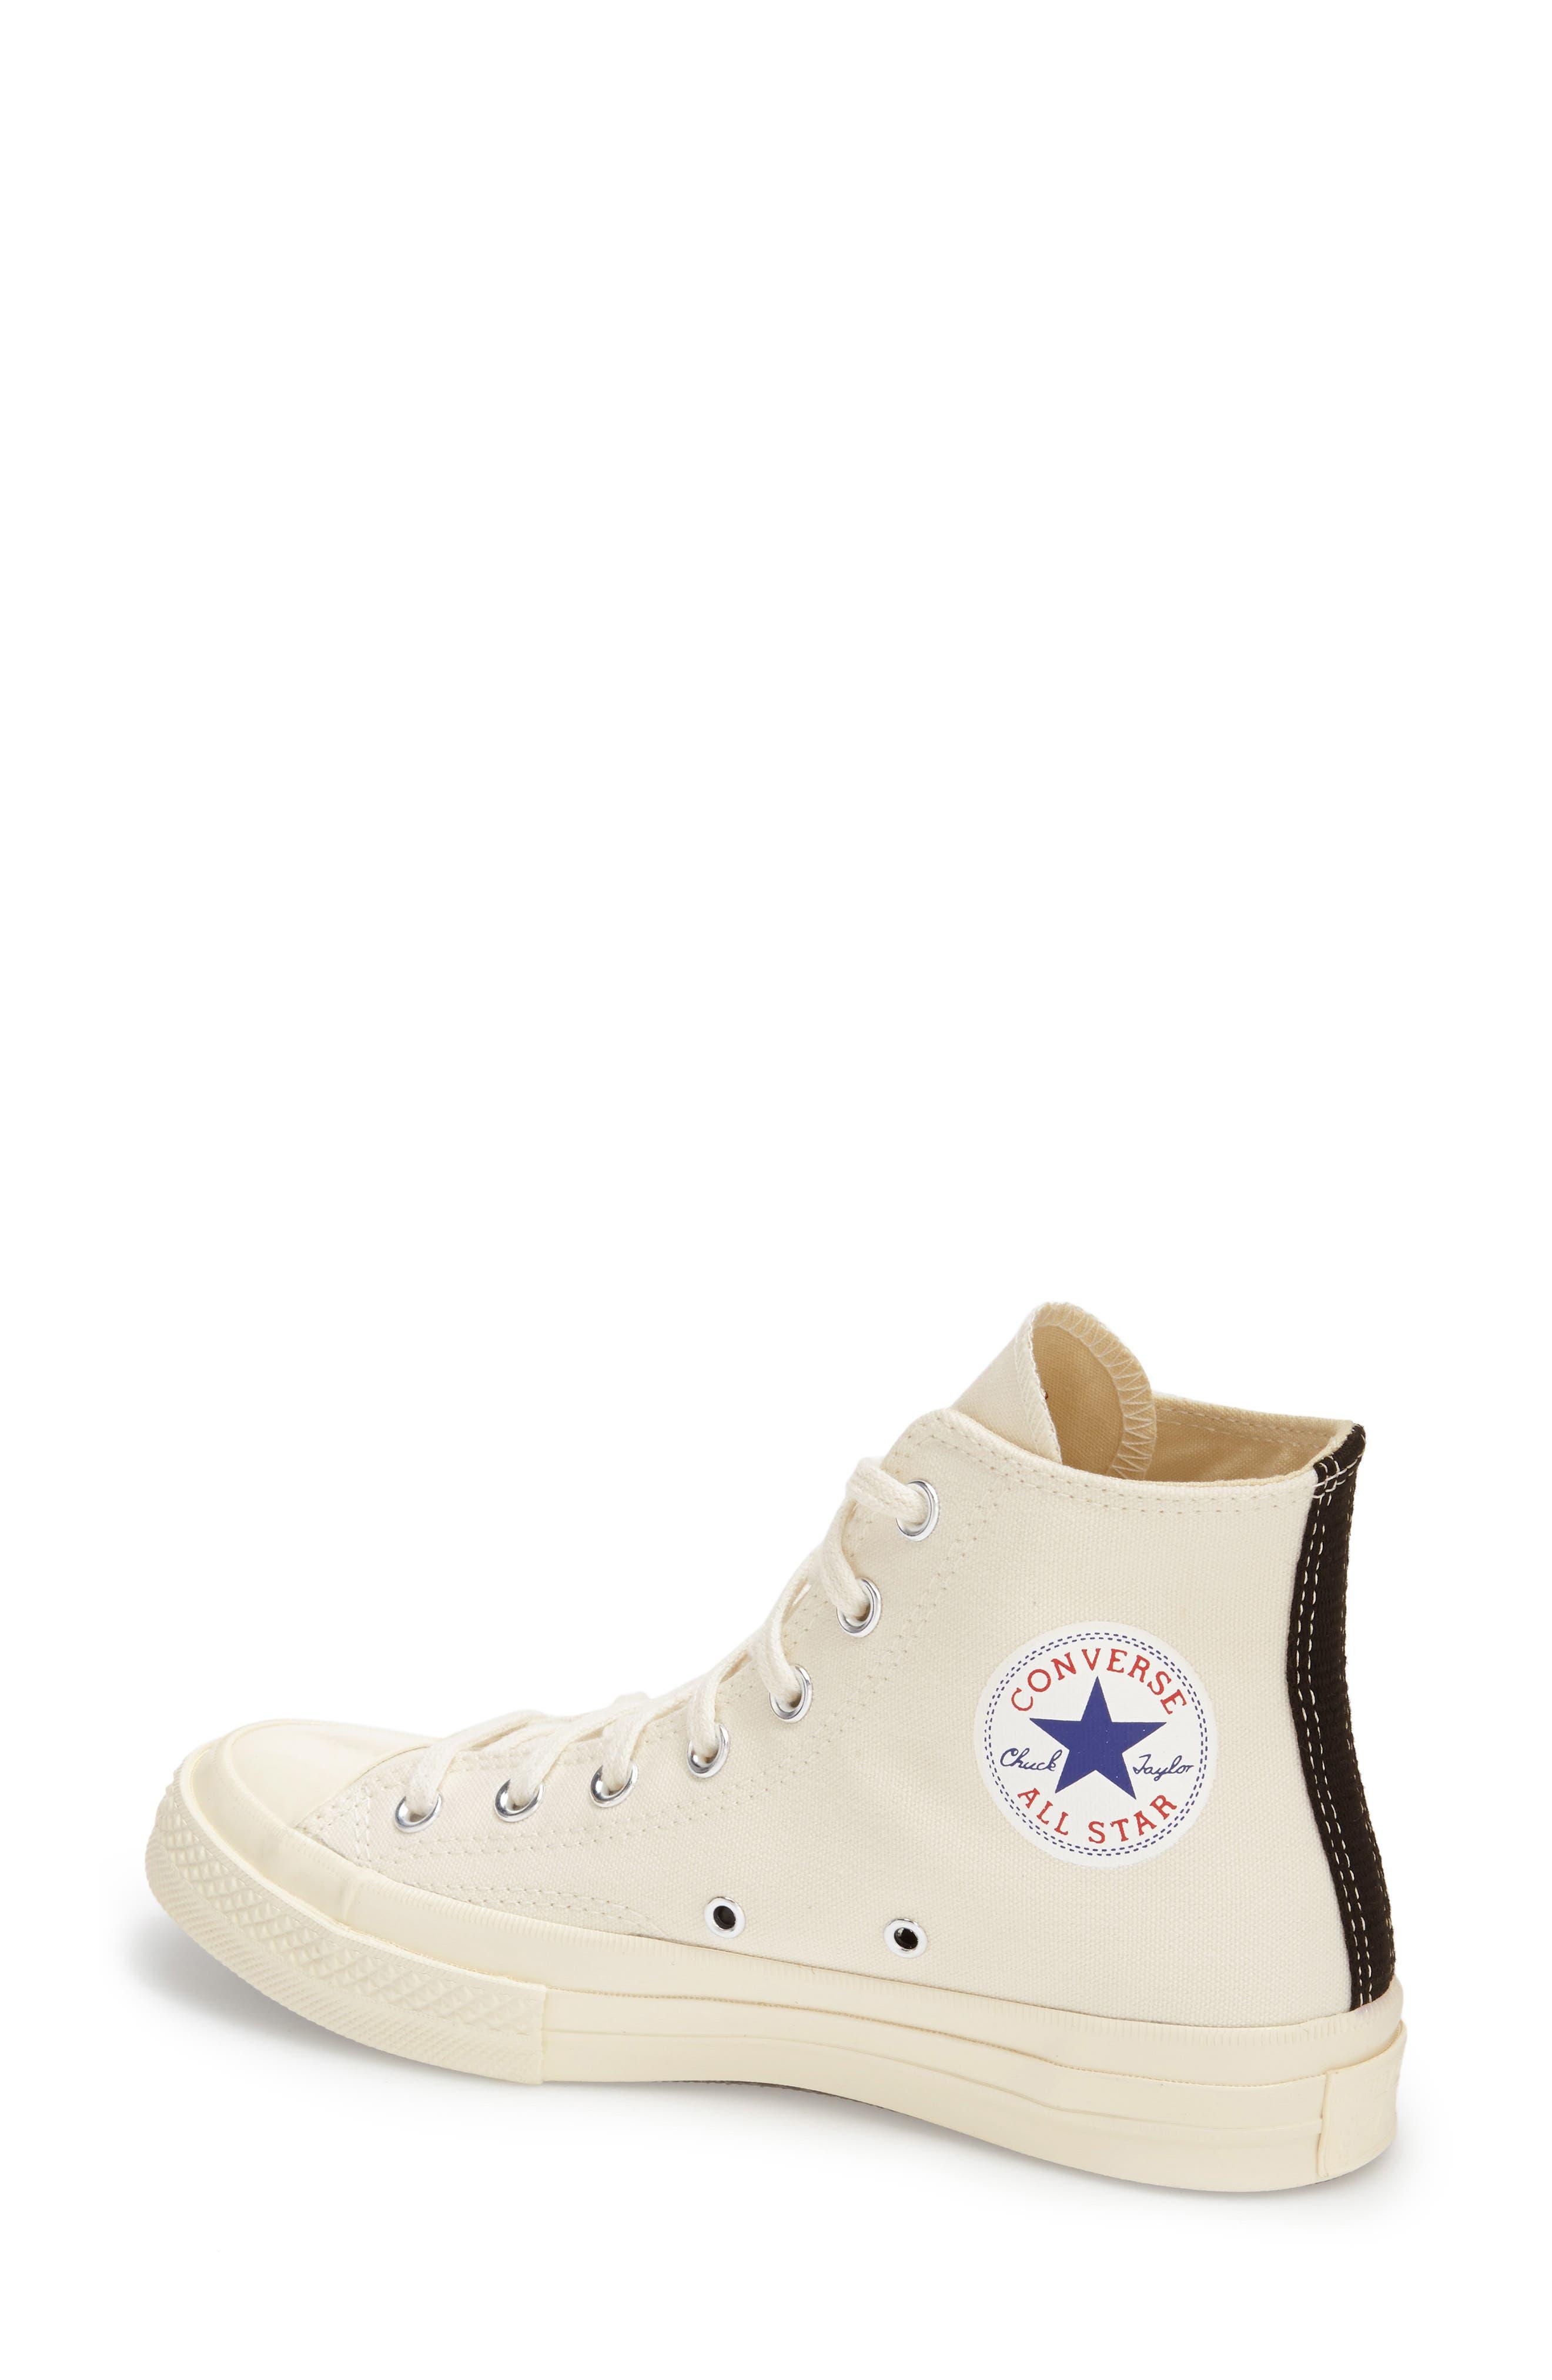 PLAYx Converse Chuck Taylor<sup>®</sup> - Hidden Heart High TopSneaker,                             Alternate thumbnail 2, color,                             WHITE CANVAS